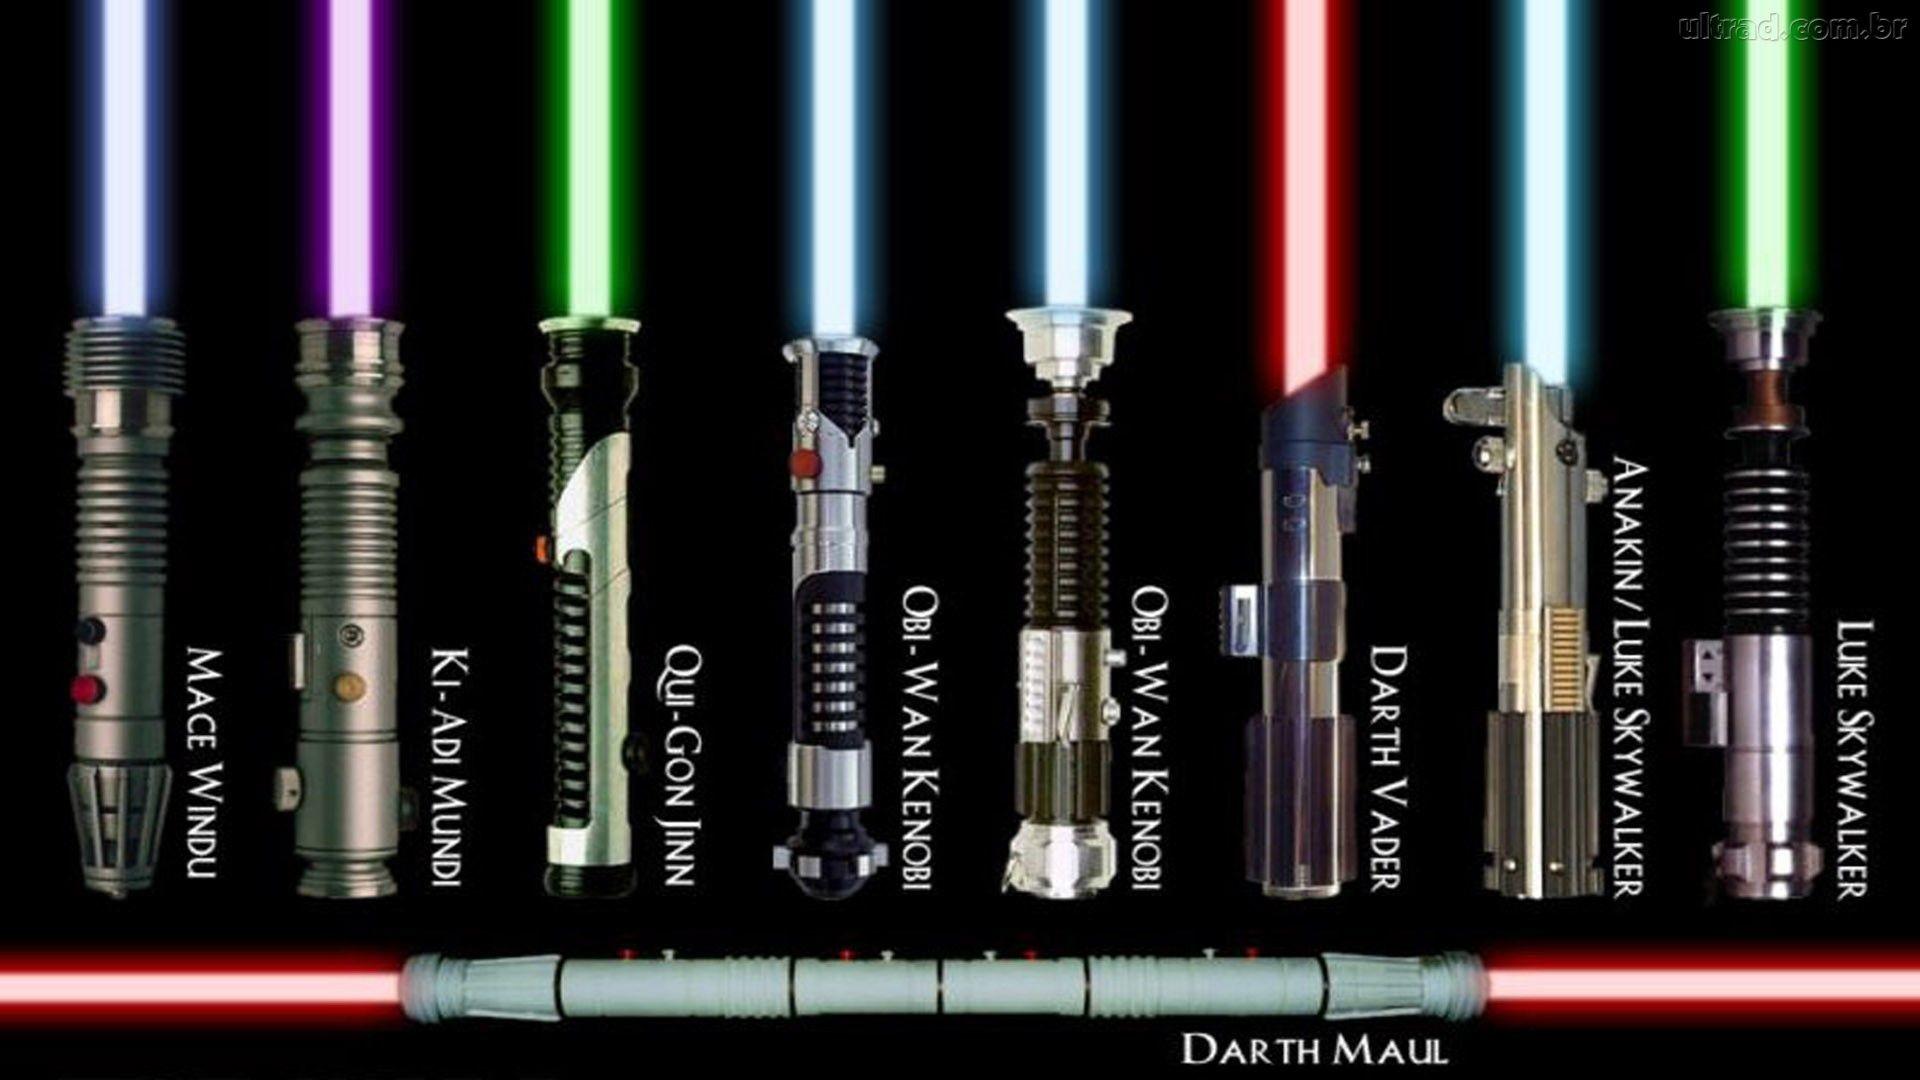 Star Wars Lightsaber, All Lightsabers, Custom Lightsabers, Lightsaber .